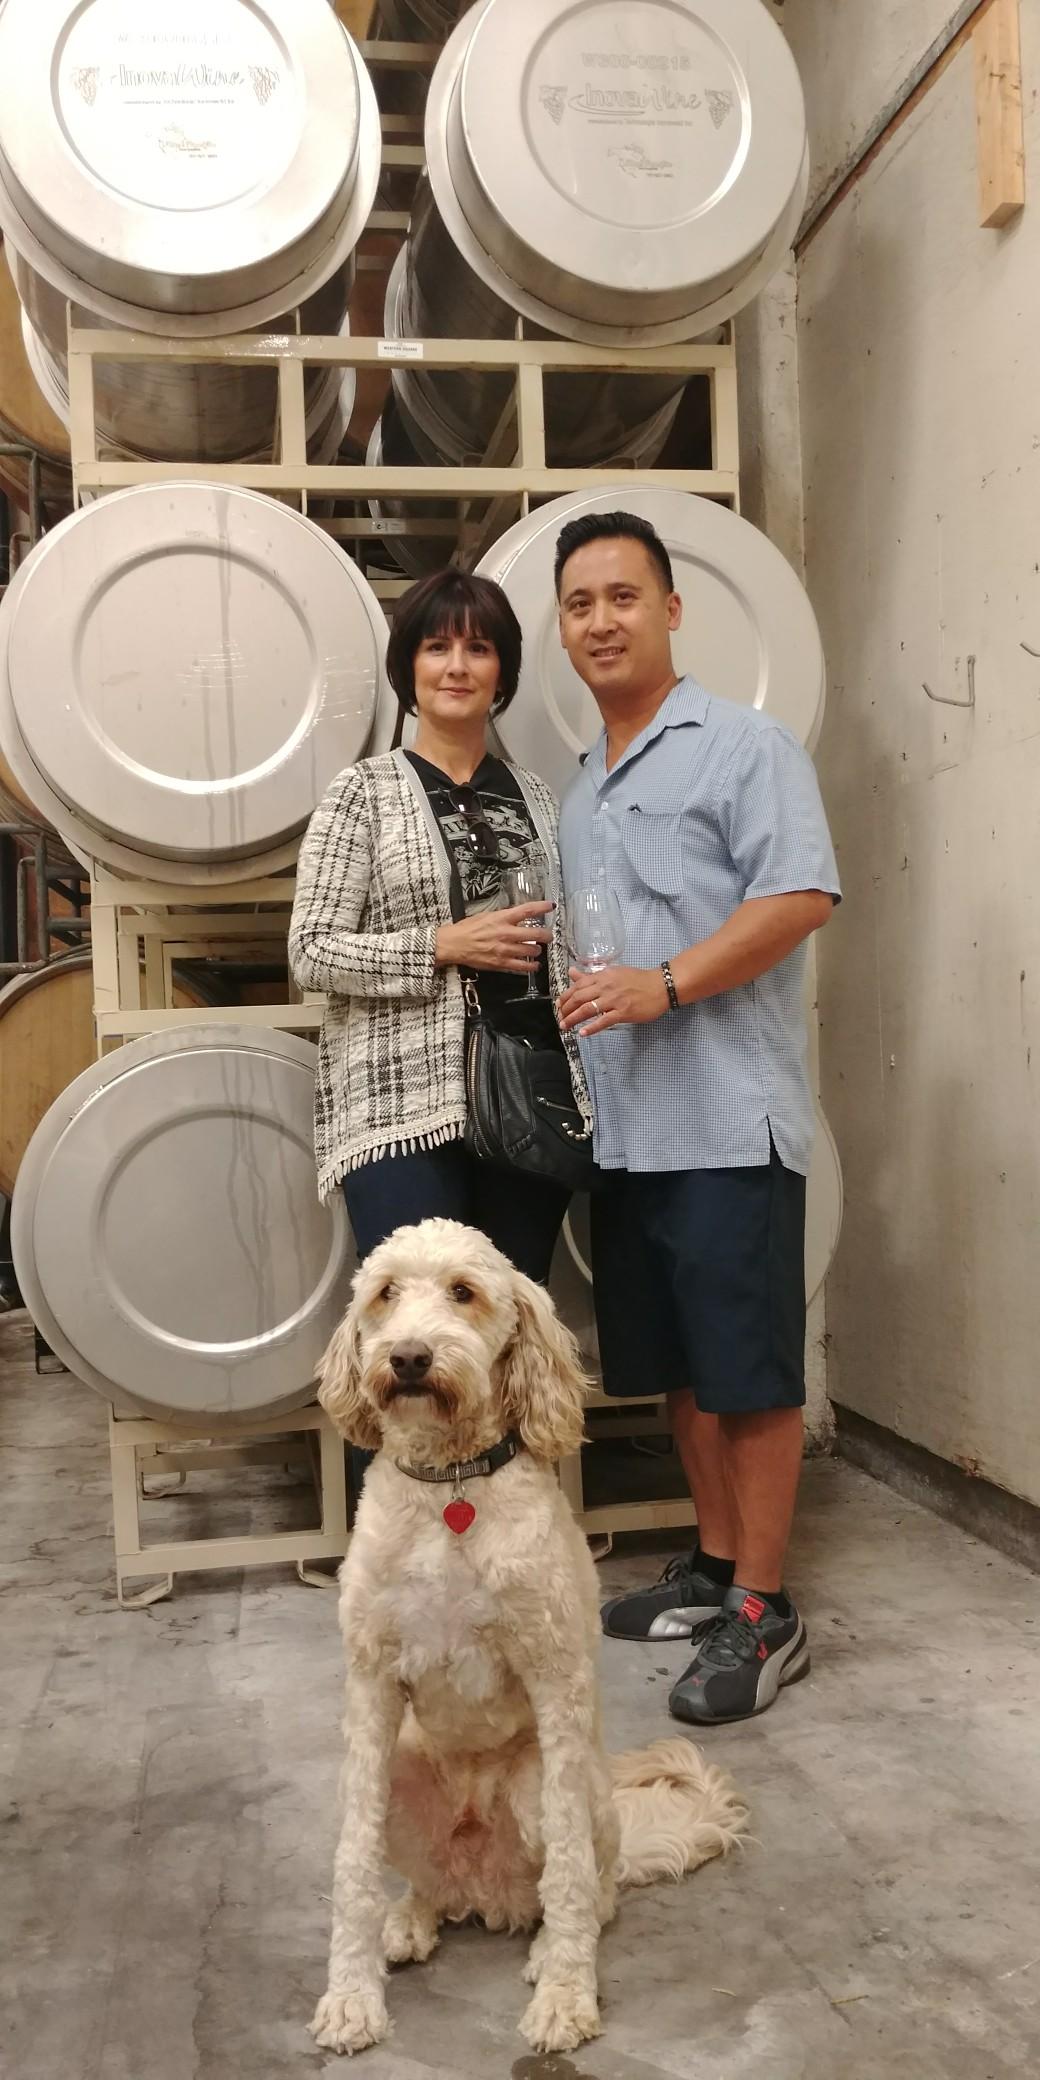 Miramonte Winery 33410 Rancho California Rd Temecula Ca